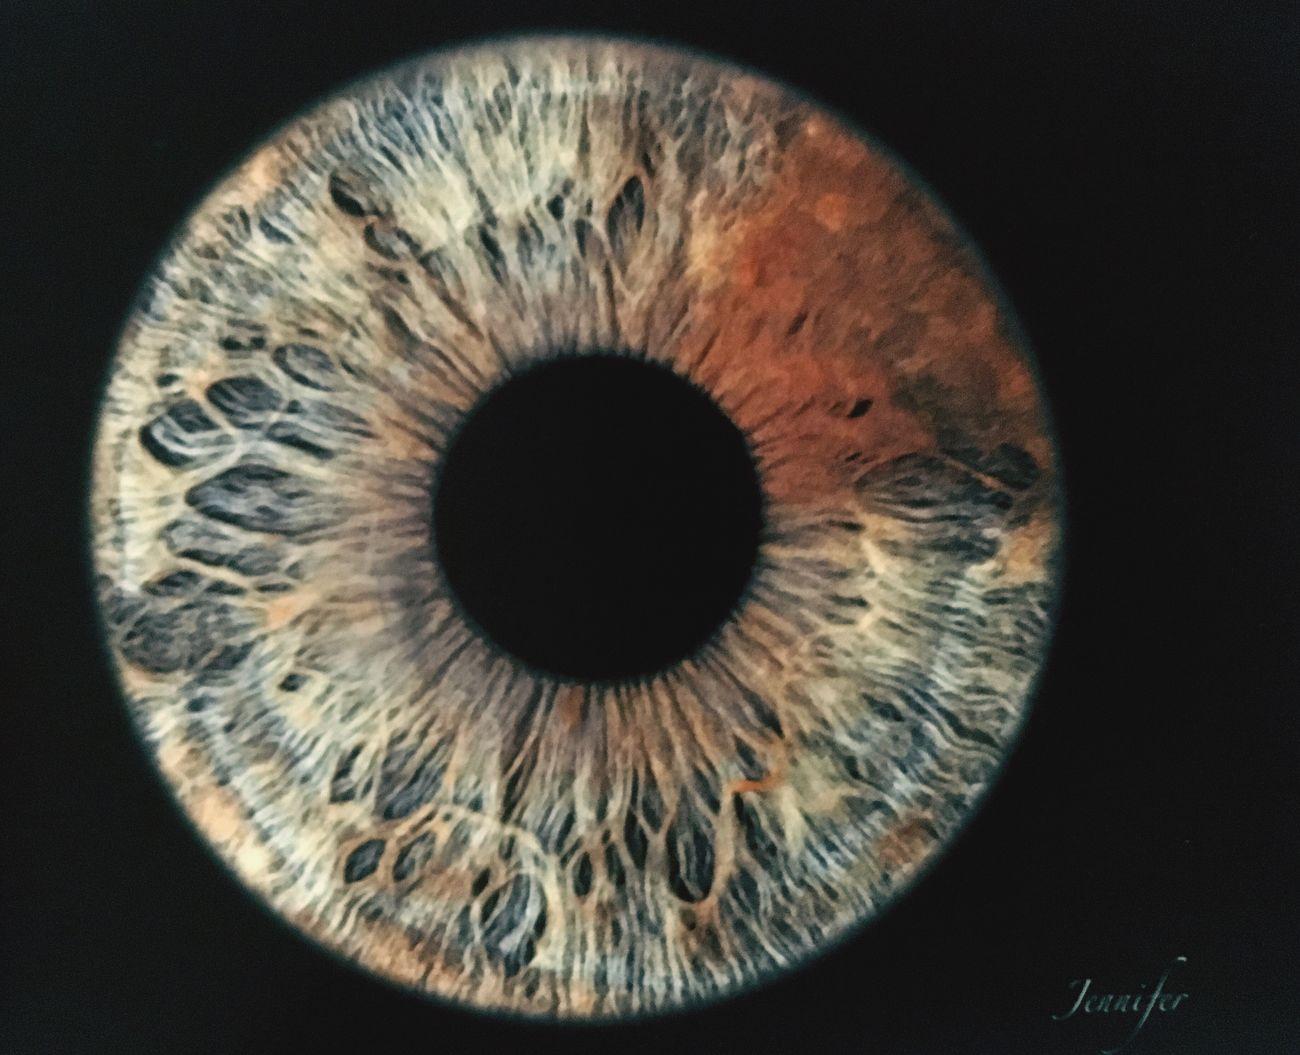 Iris - Eye Eyeball Studio Shot Green Grey Brown Myeyes No People Black Background Astronomy Day Science Eyesight Sensory Perception Eyelash Close-up Indoors